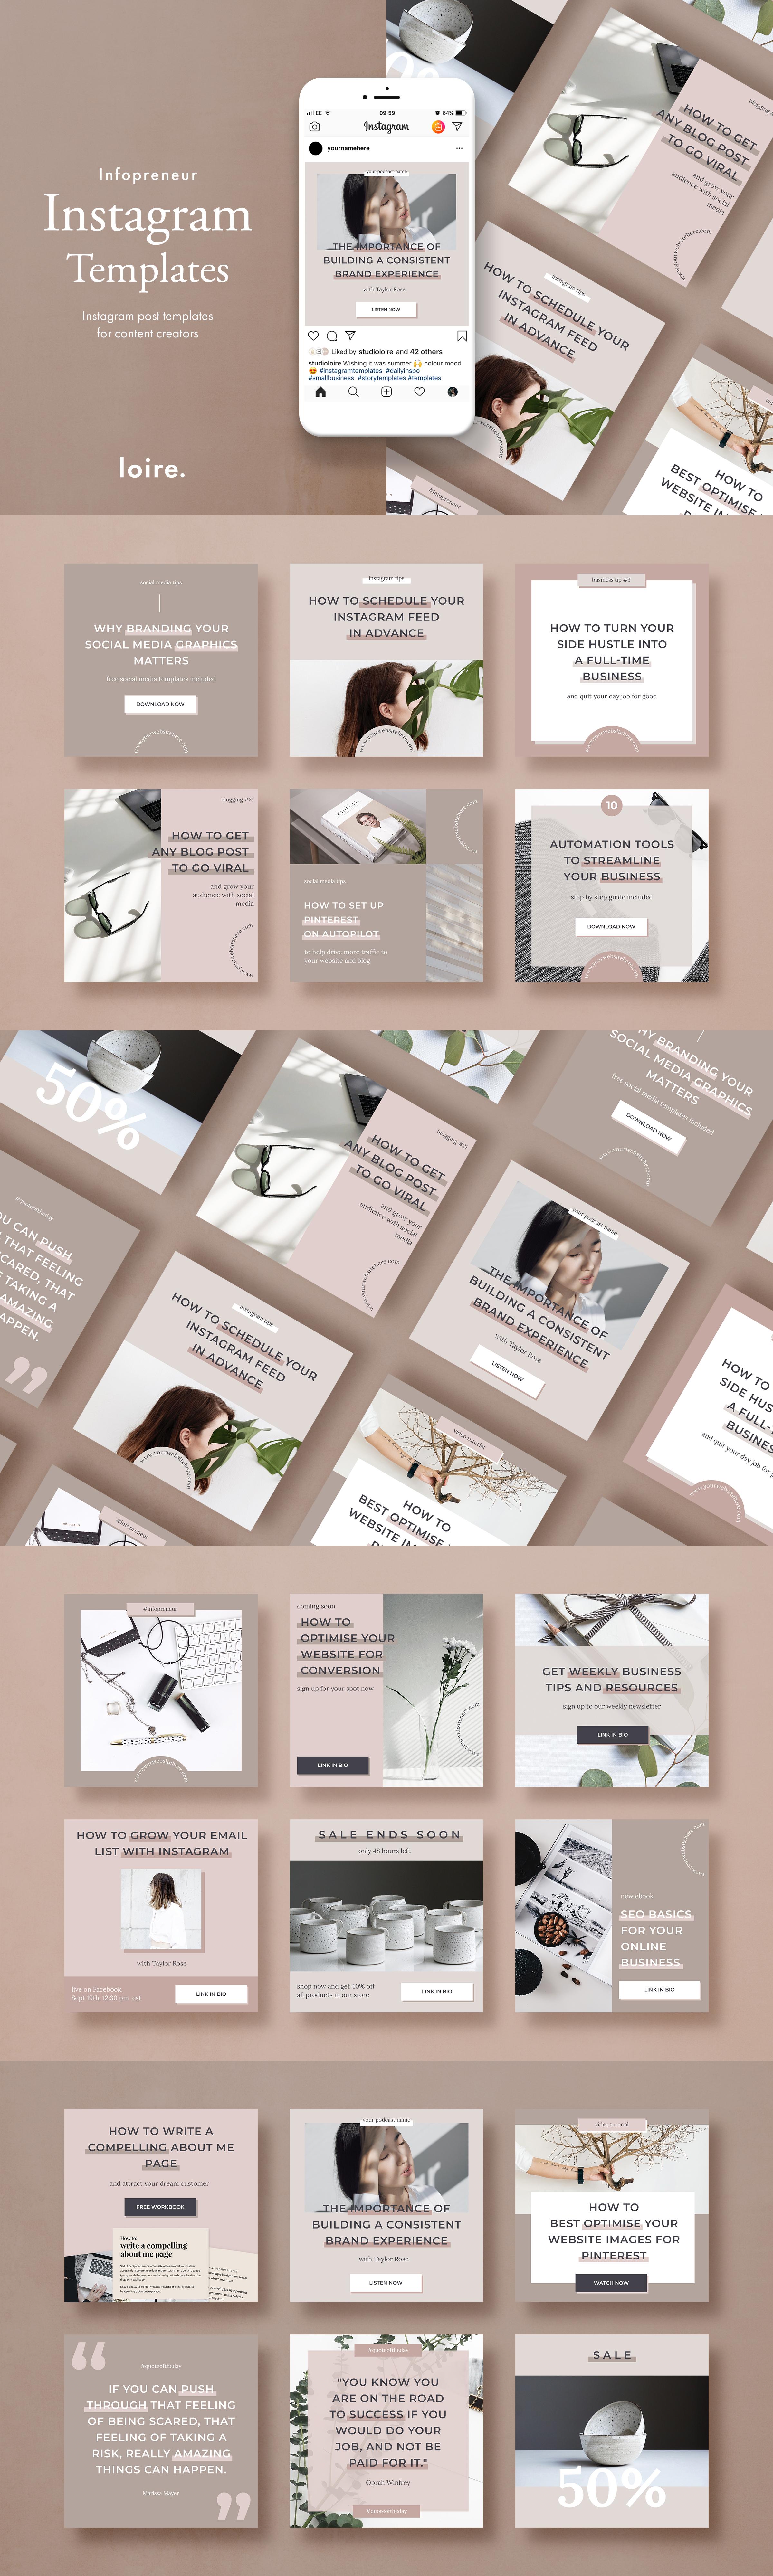 Infopreneur social media marketing bundle for bloggers example image 7